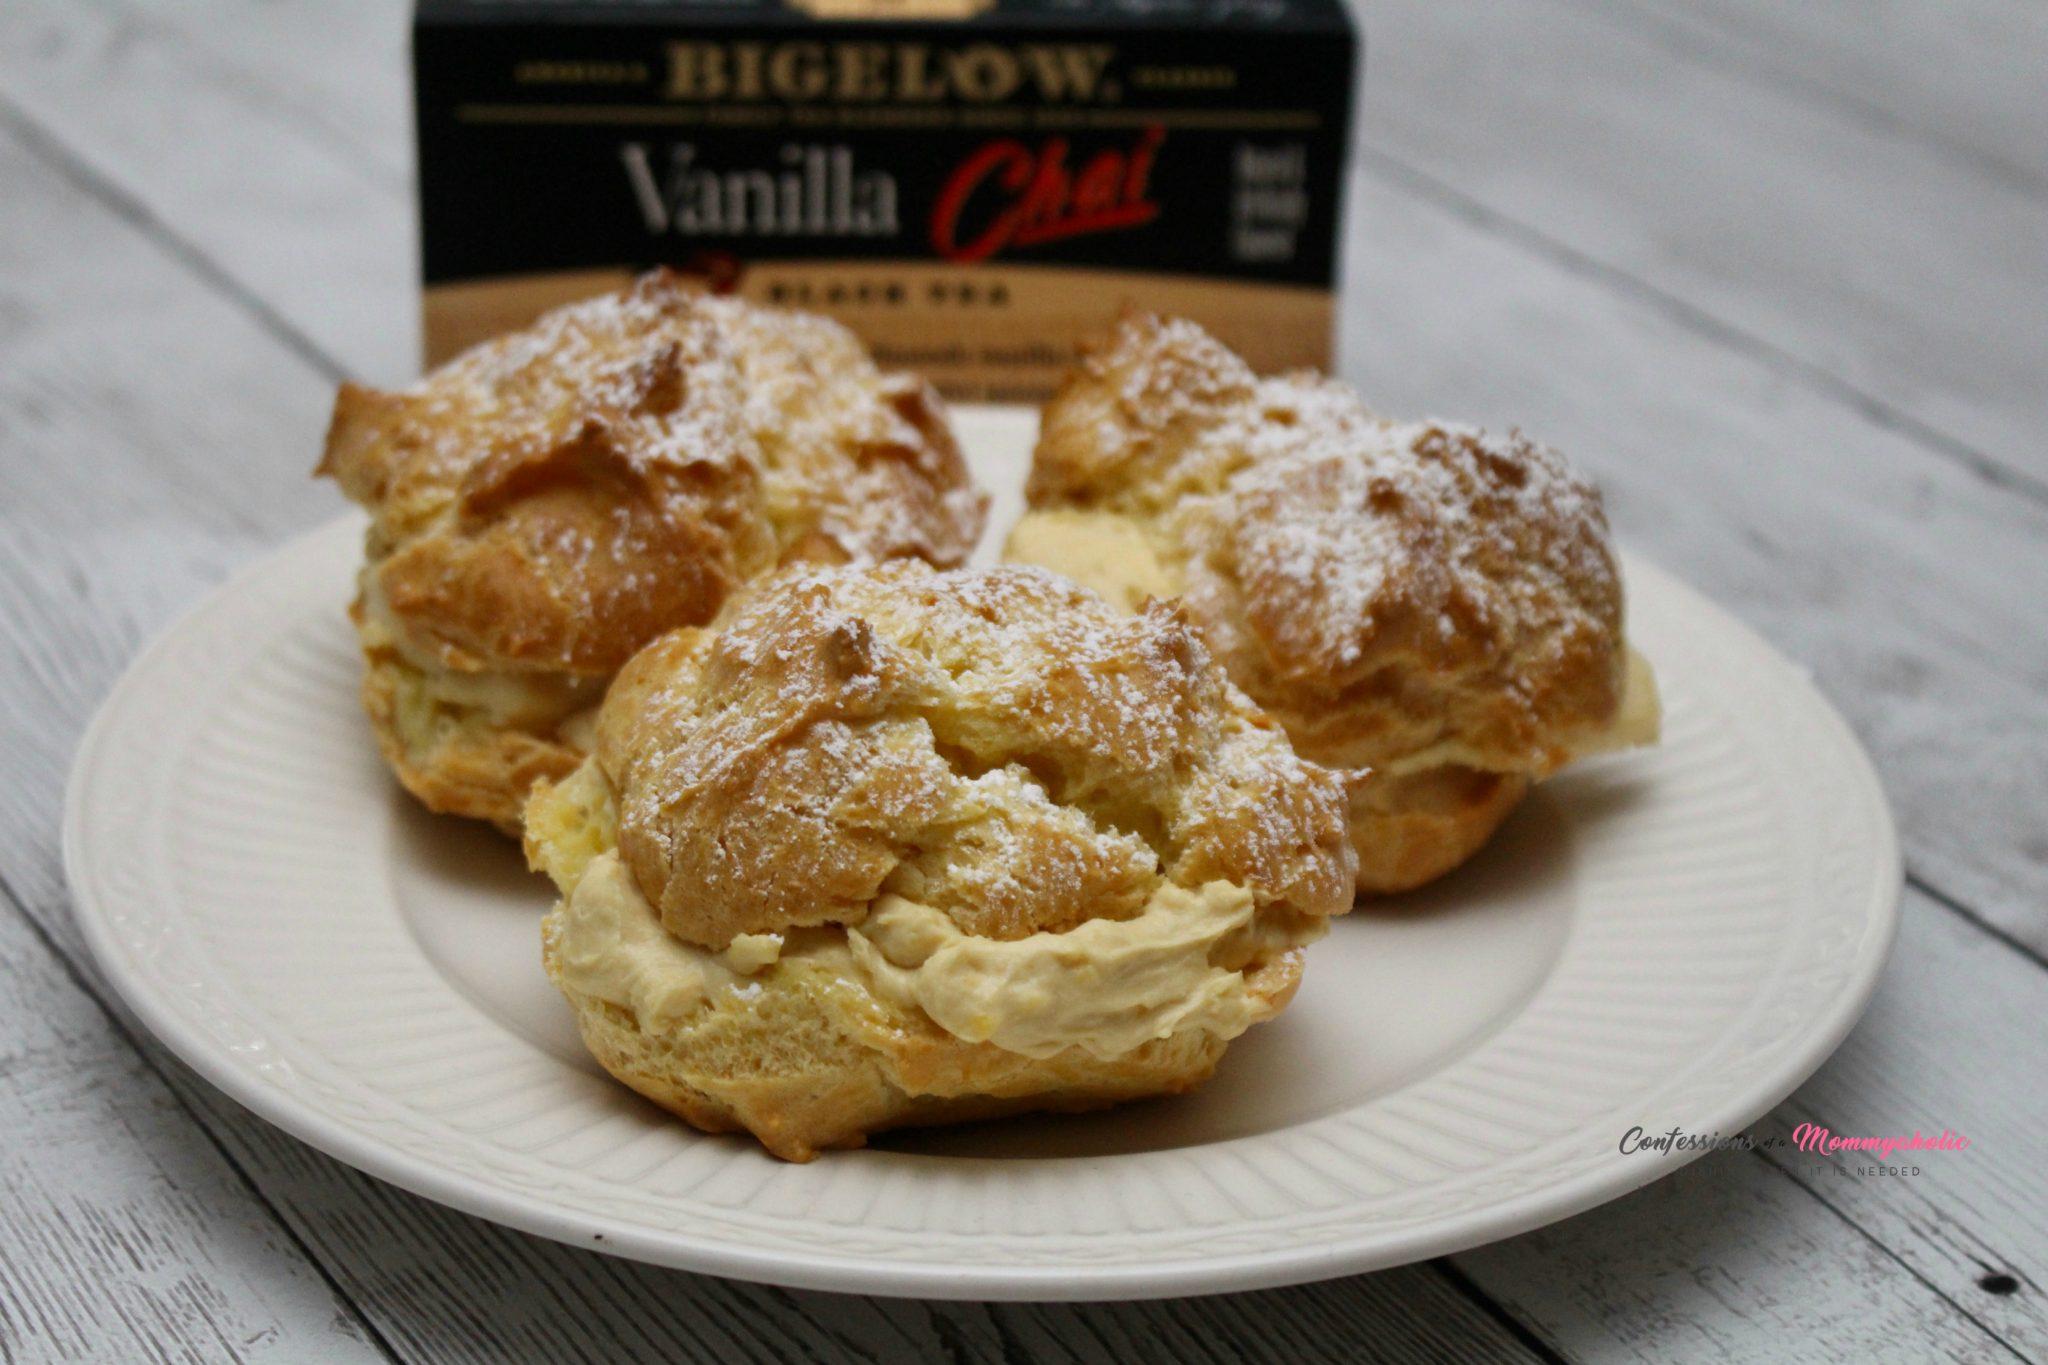 Cream Puffs and Bigelow Vanilla Chai Tea Package